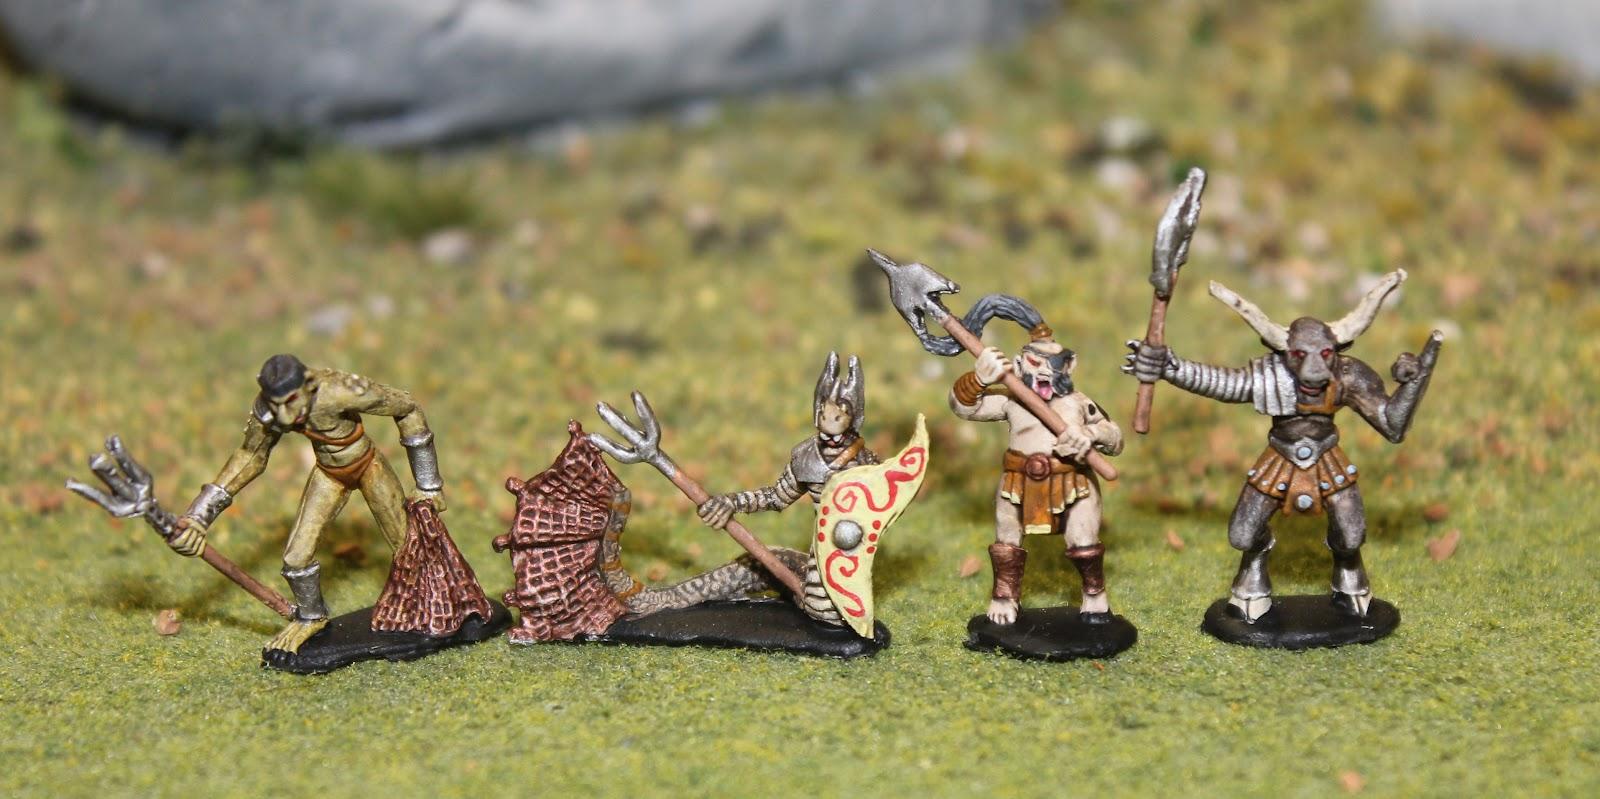 Splintered Light Miniatures: 15mm Fantasy Gladiator Preview